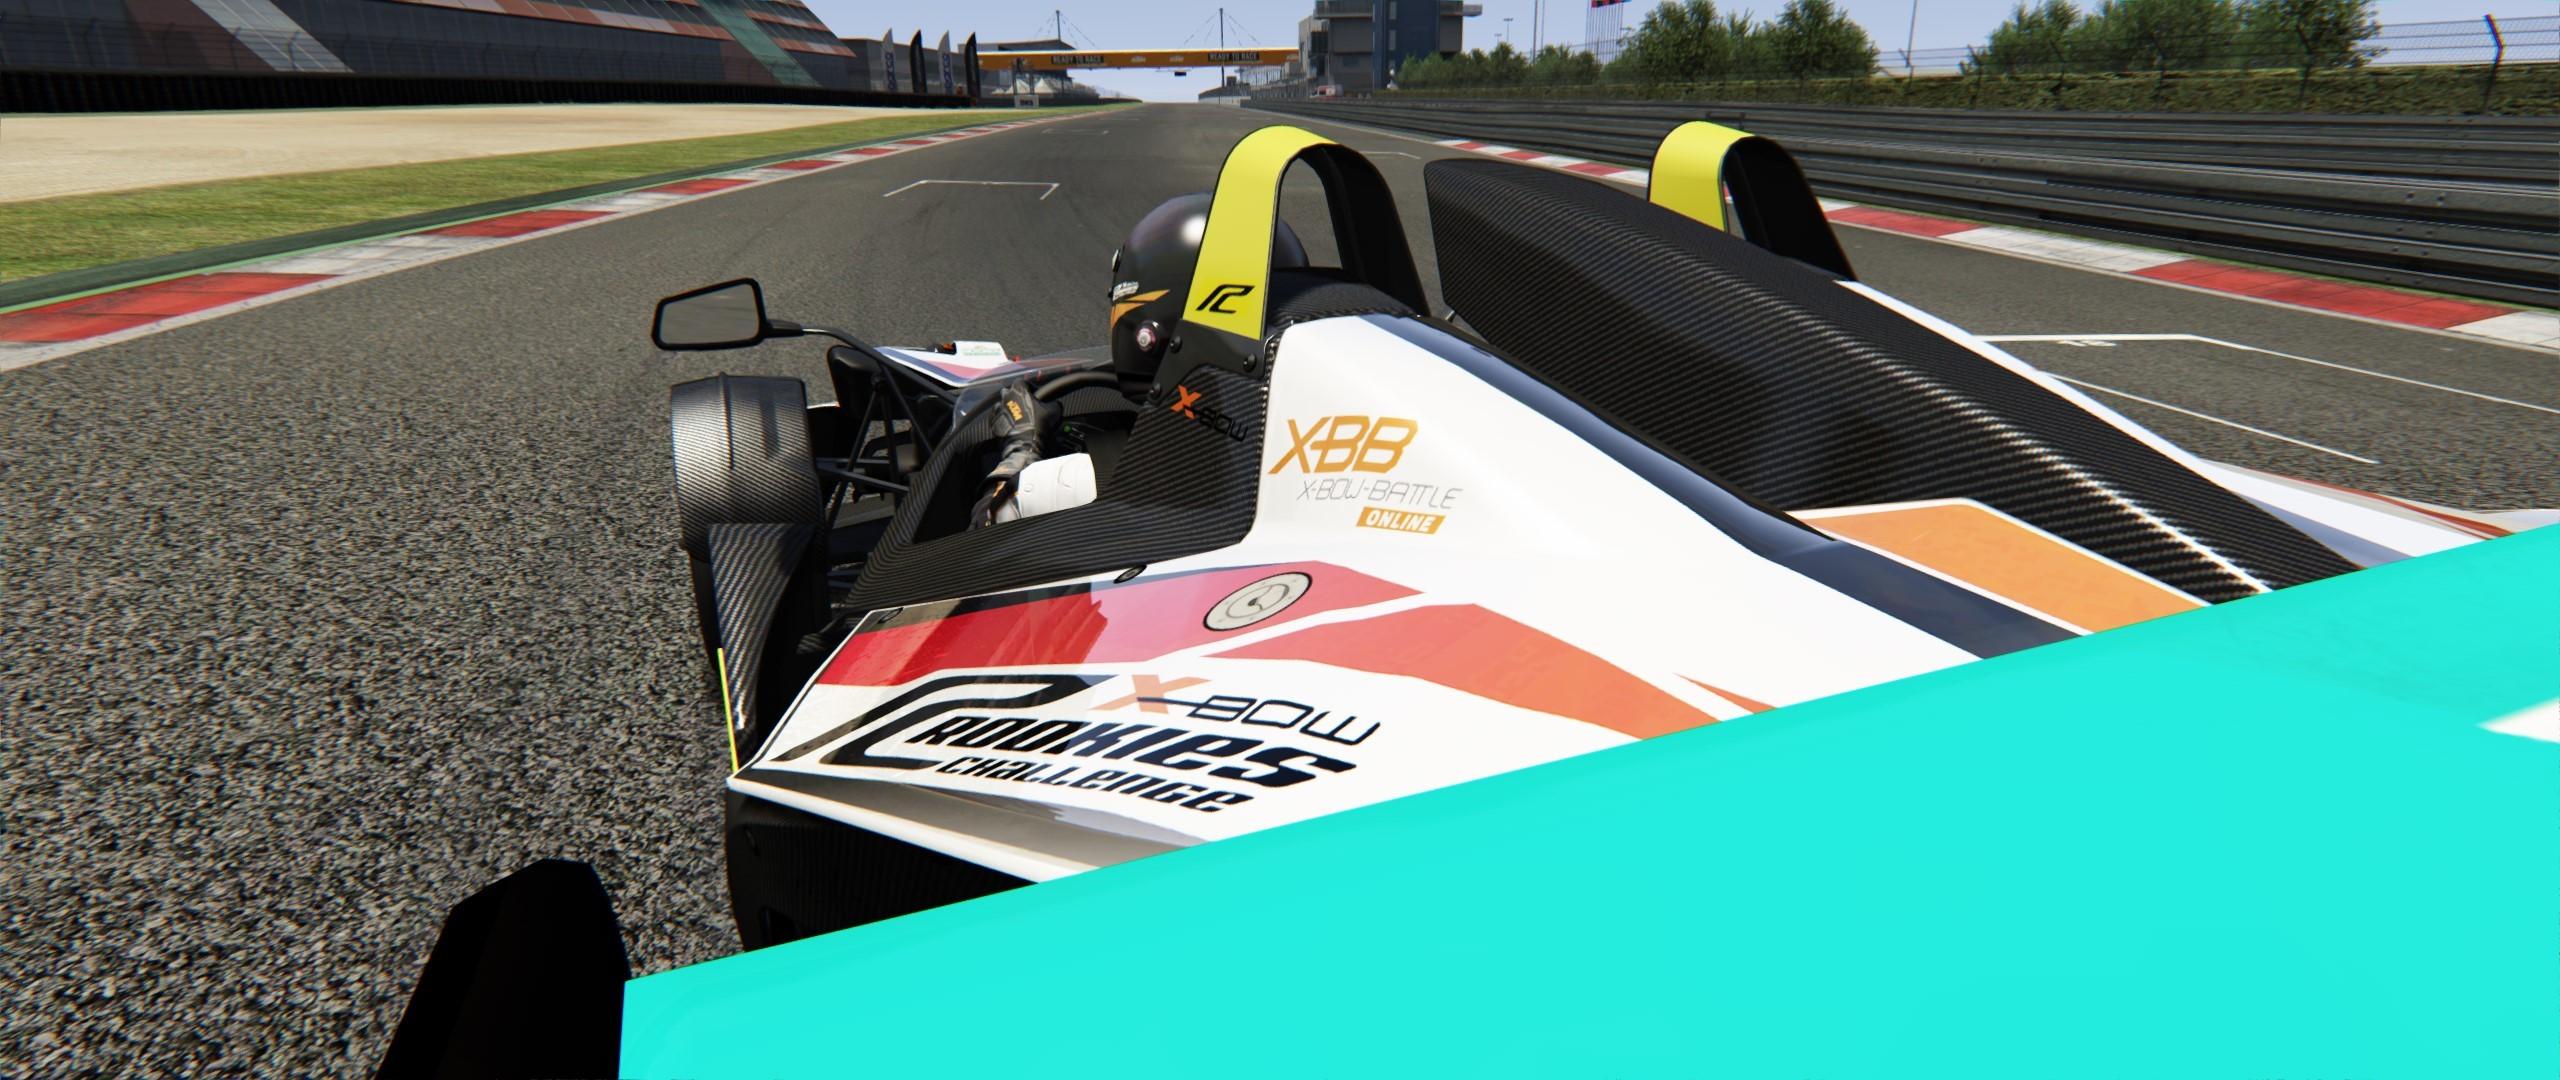 Sim Racing with the KTM X-BOW - KTM BLOG